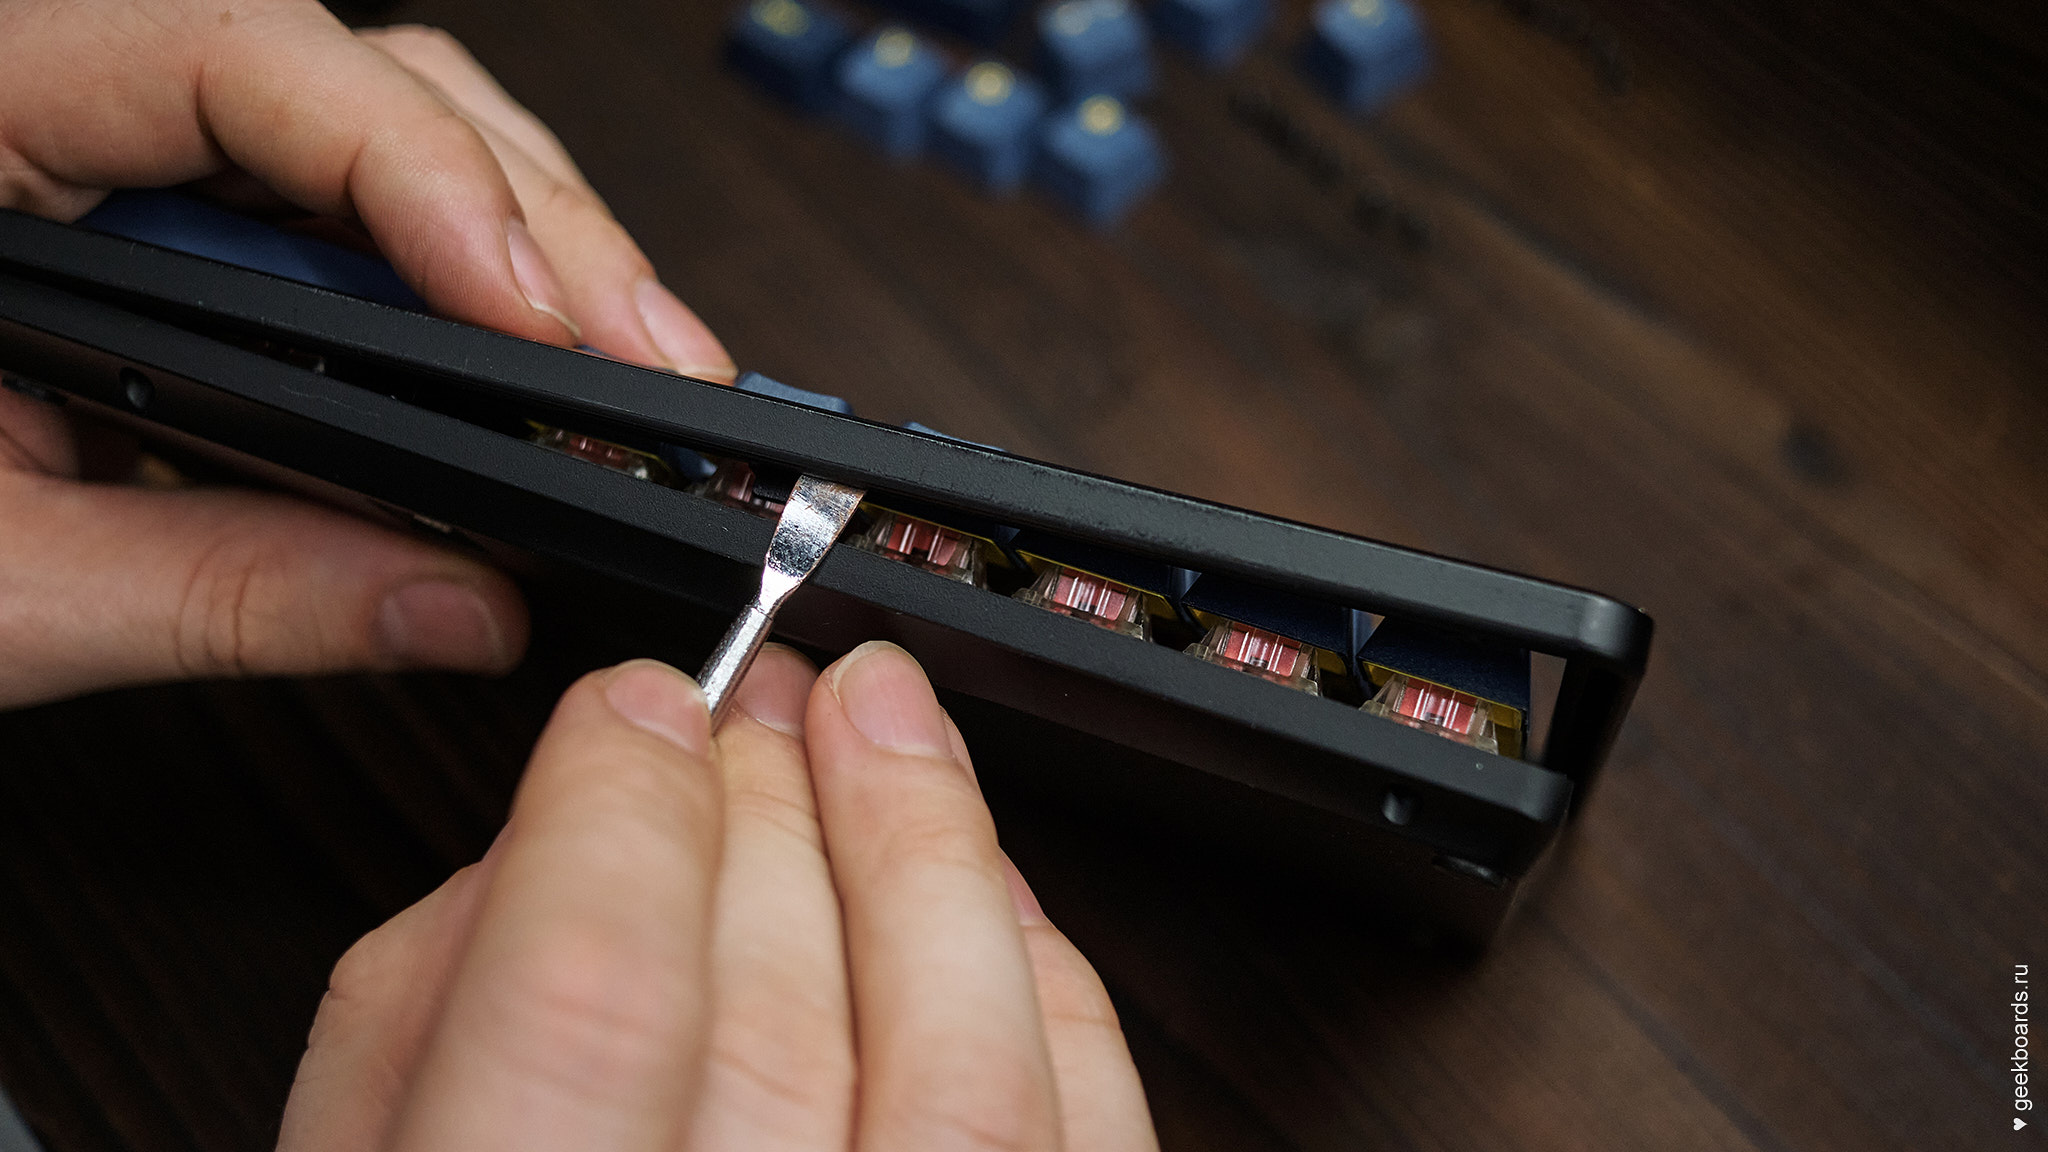 MISTEL BAROCCO MD770RGB BT BLACK отщелкиваем защелки